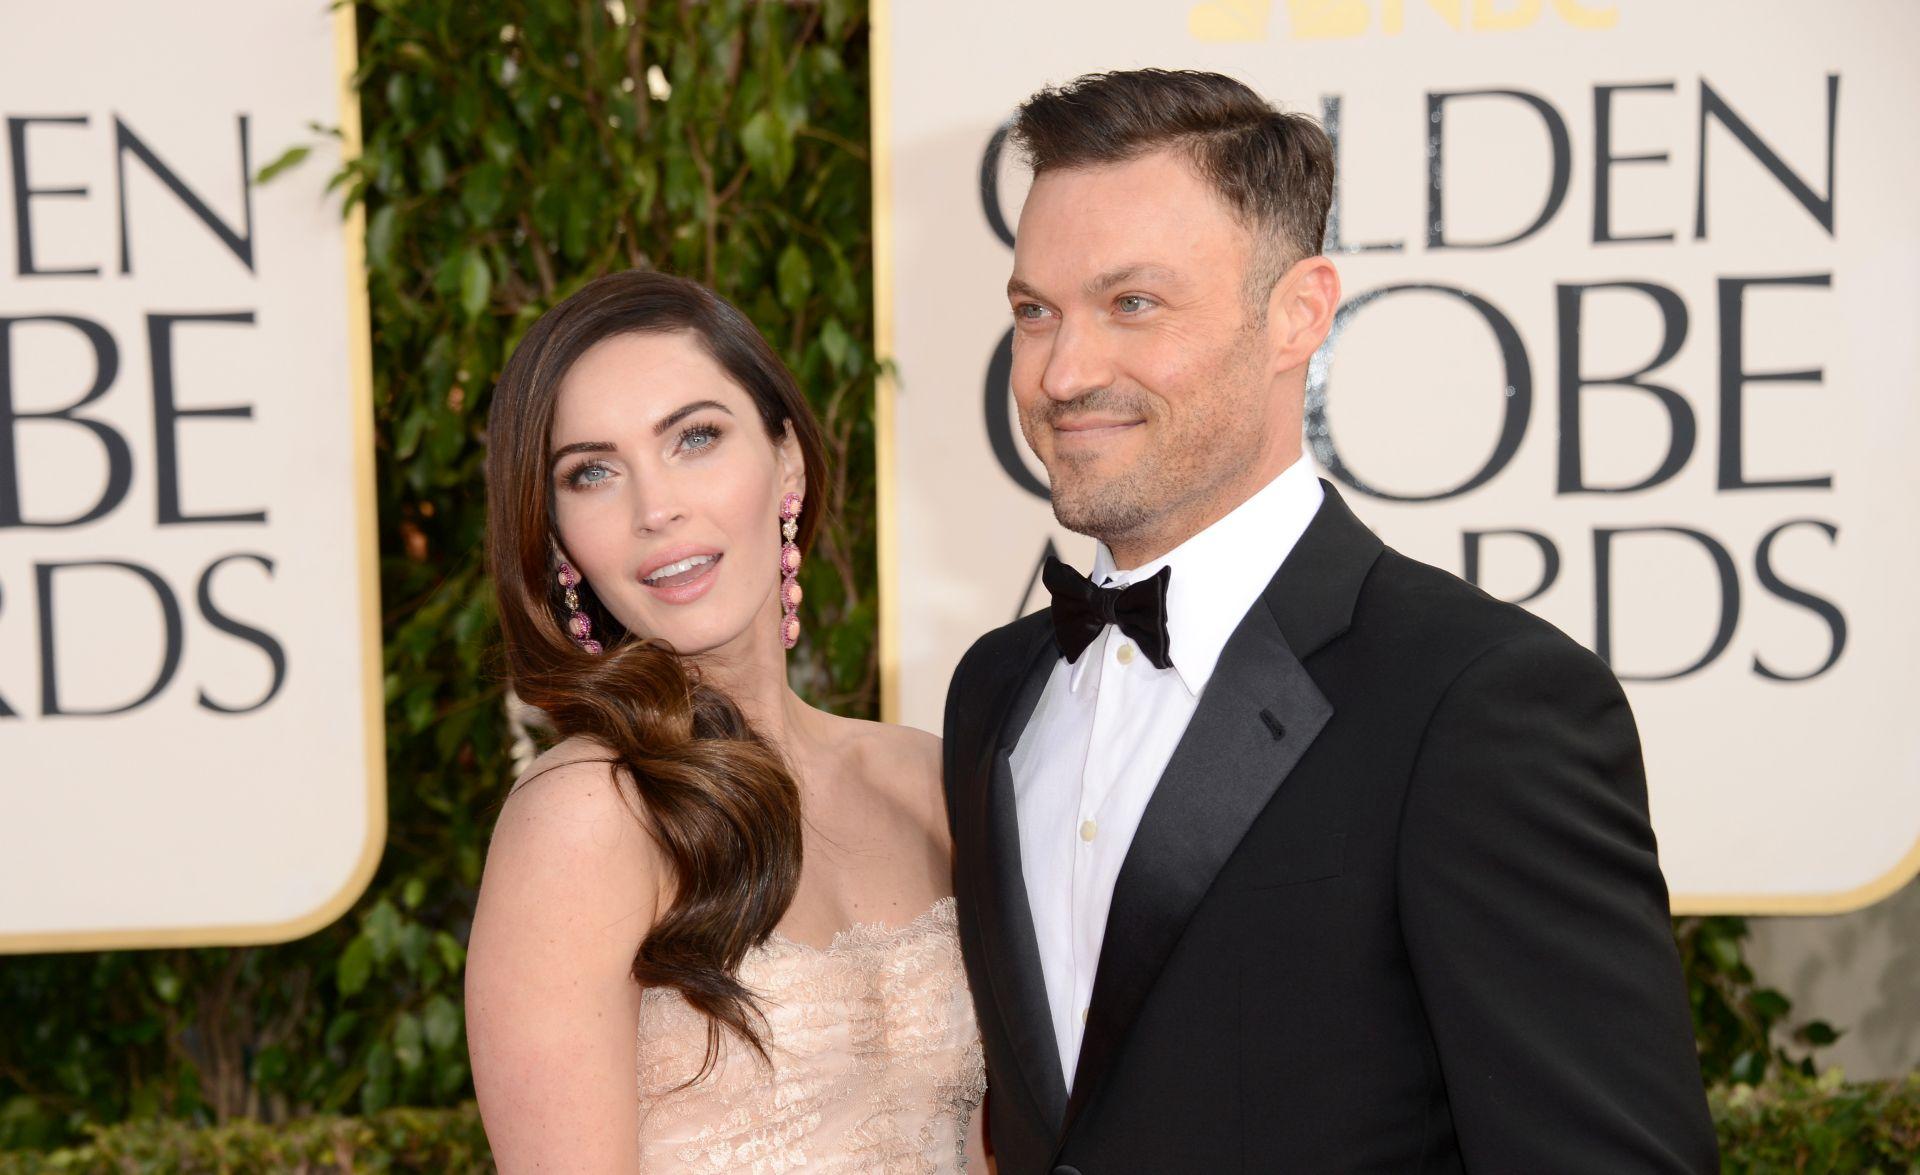 JOŠ JEDAN HOLIVUDSKI RAZVOD Razišli se Megan Fox i Brian Austin Green